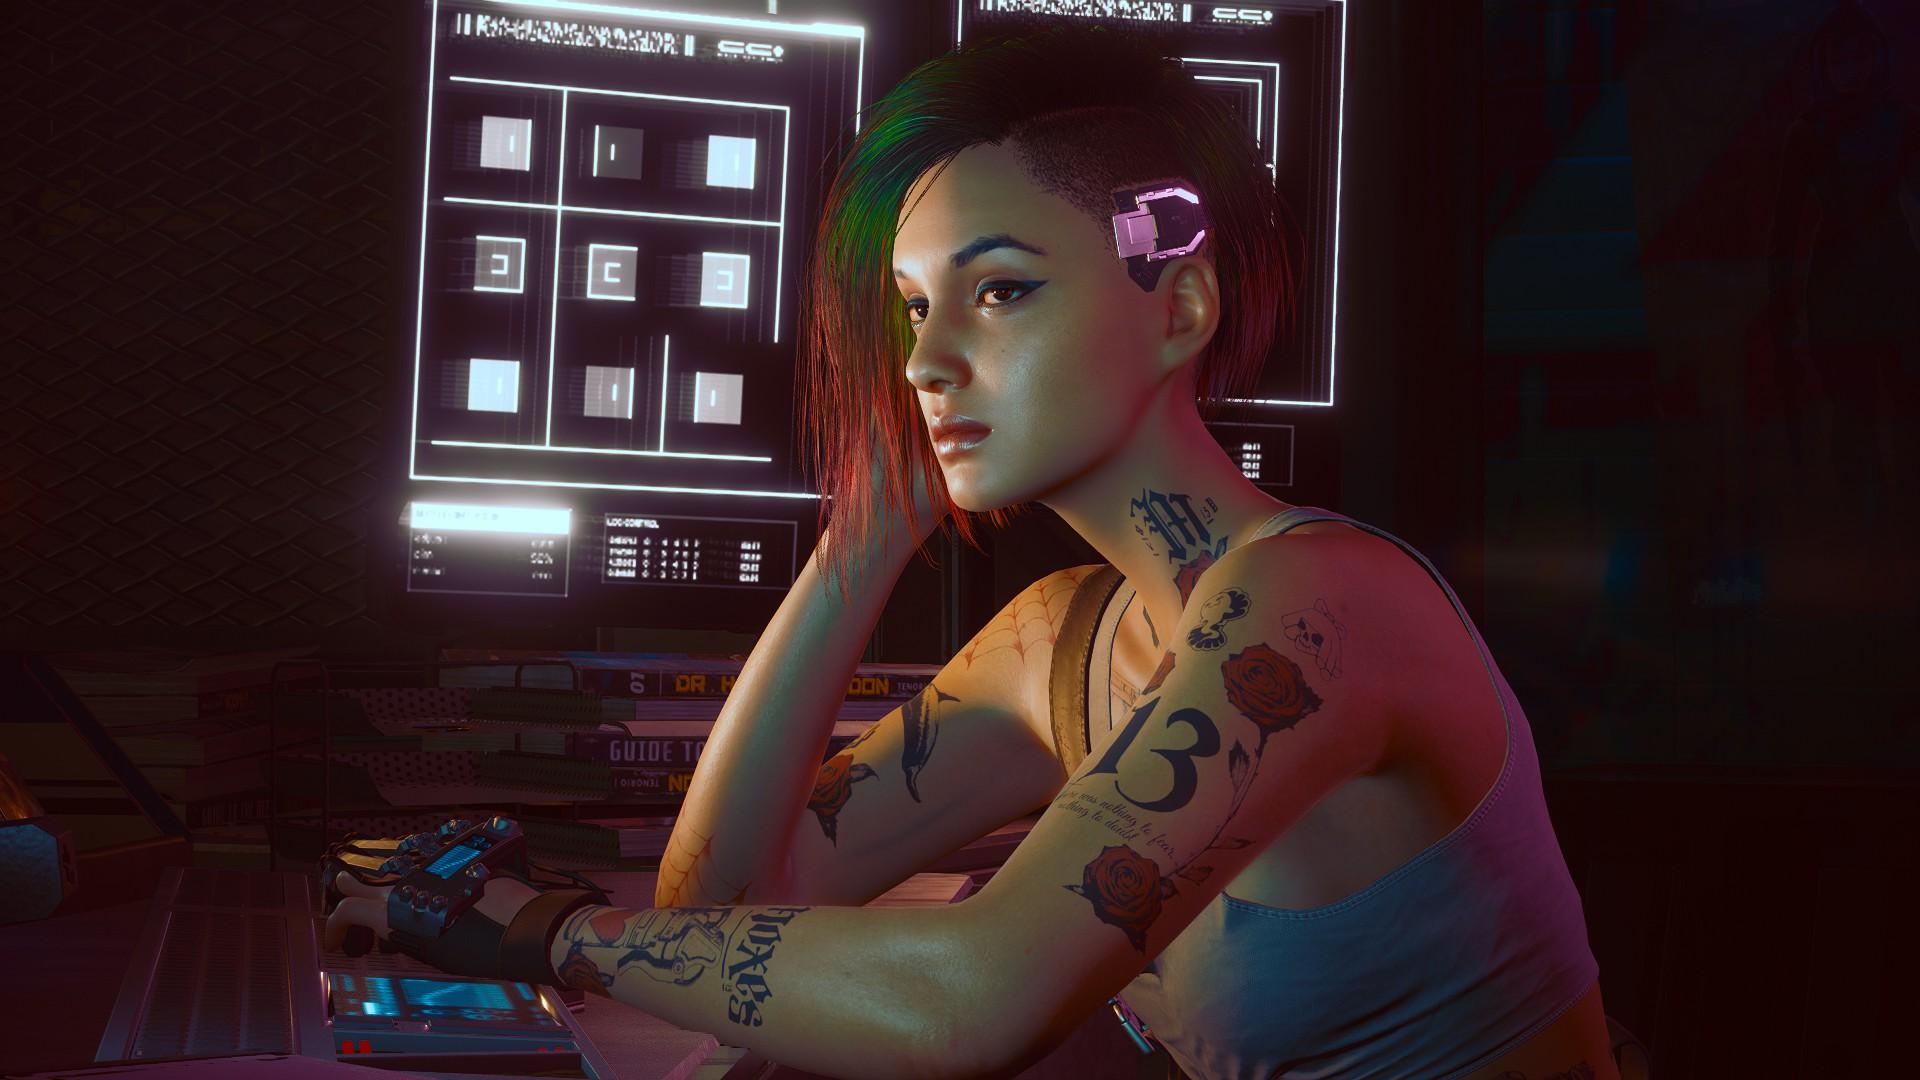 Cyberpunk 2077 обогнала The Last of Us: Part 2 по продажам в Британии